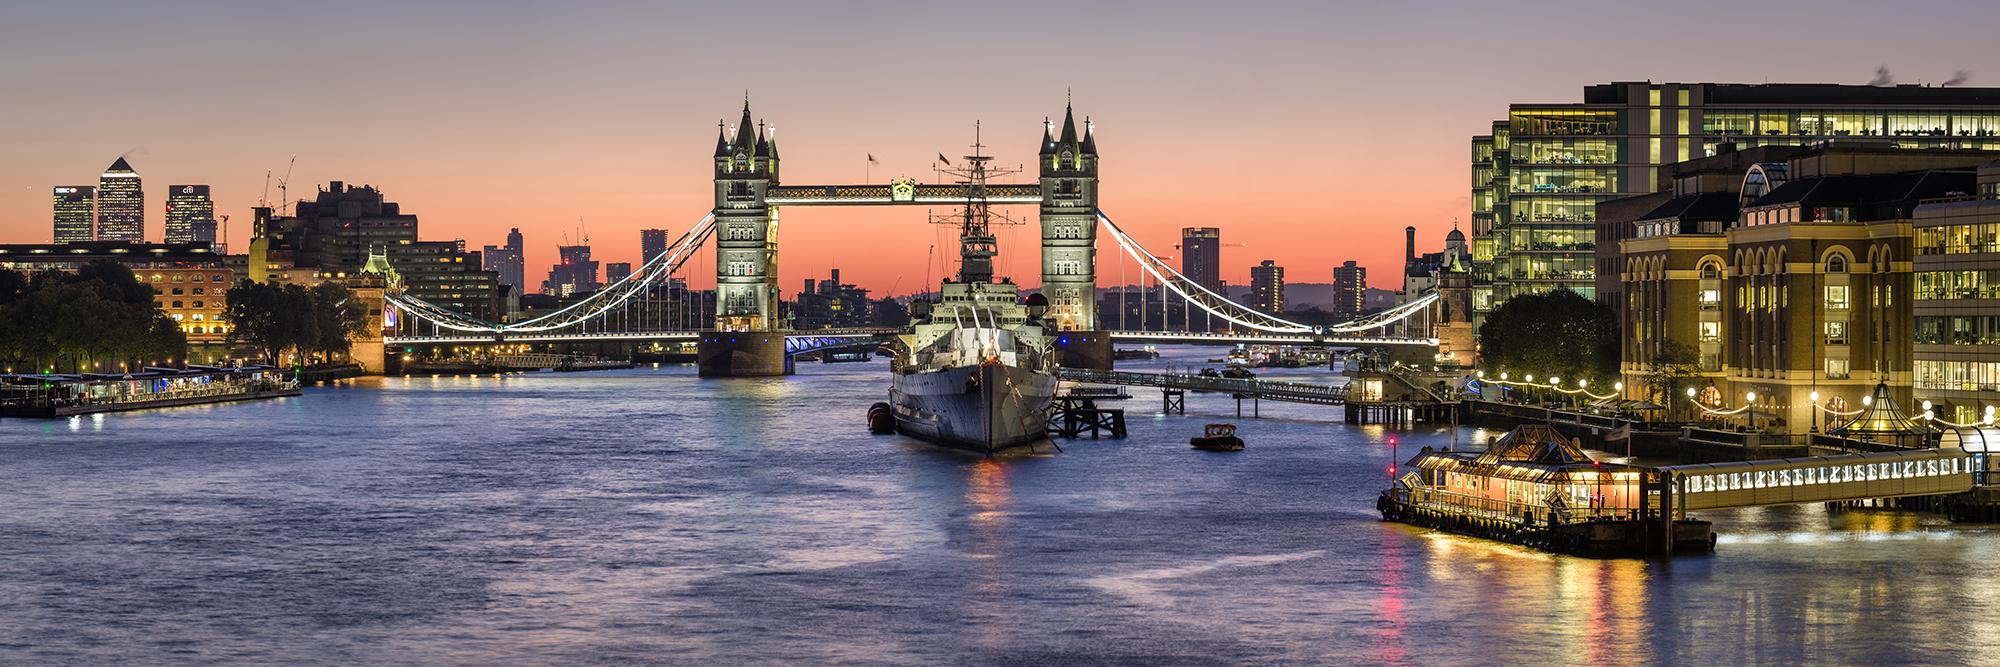 Panoramic of Tower Bridge at sunrise by Trevor Sherwin